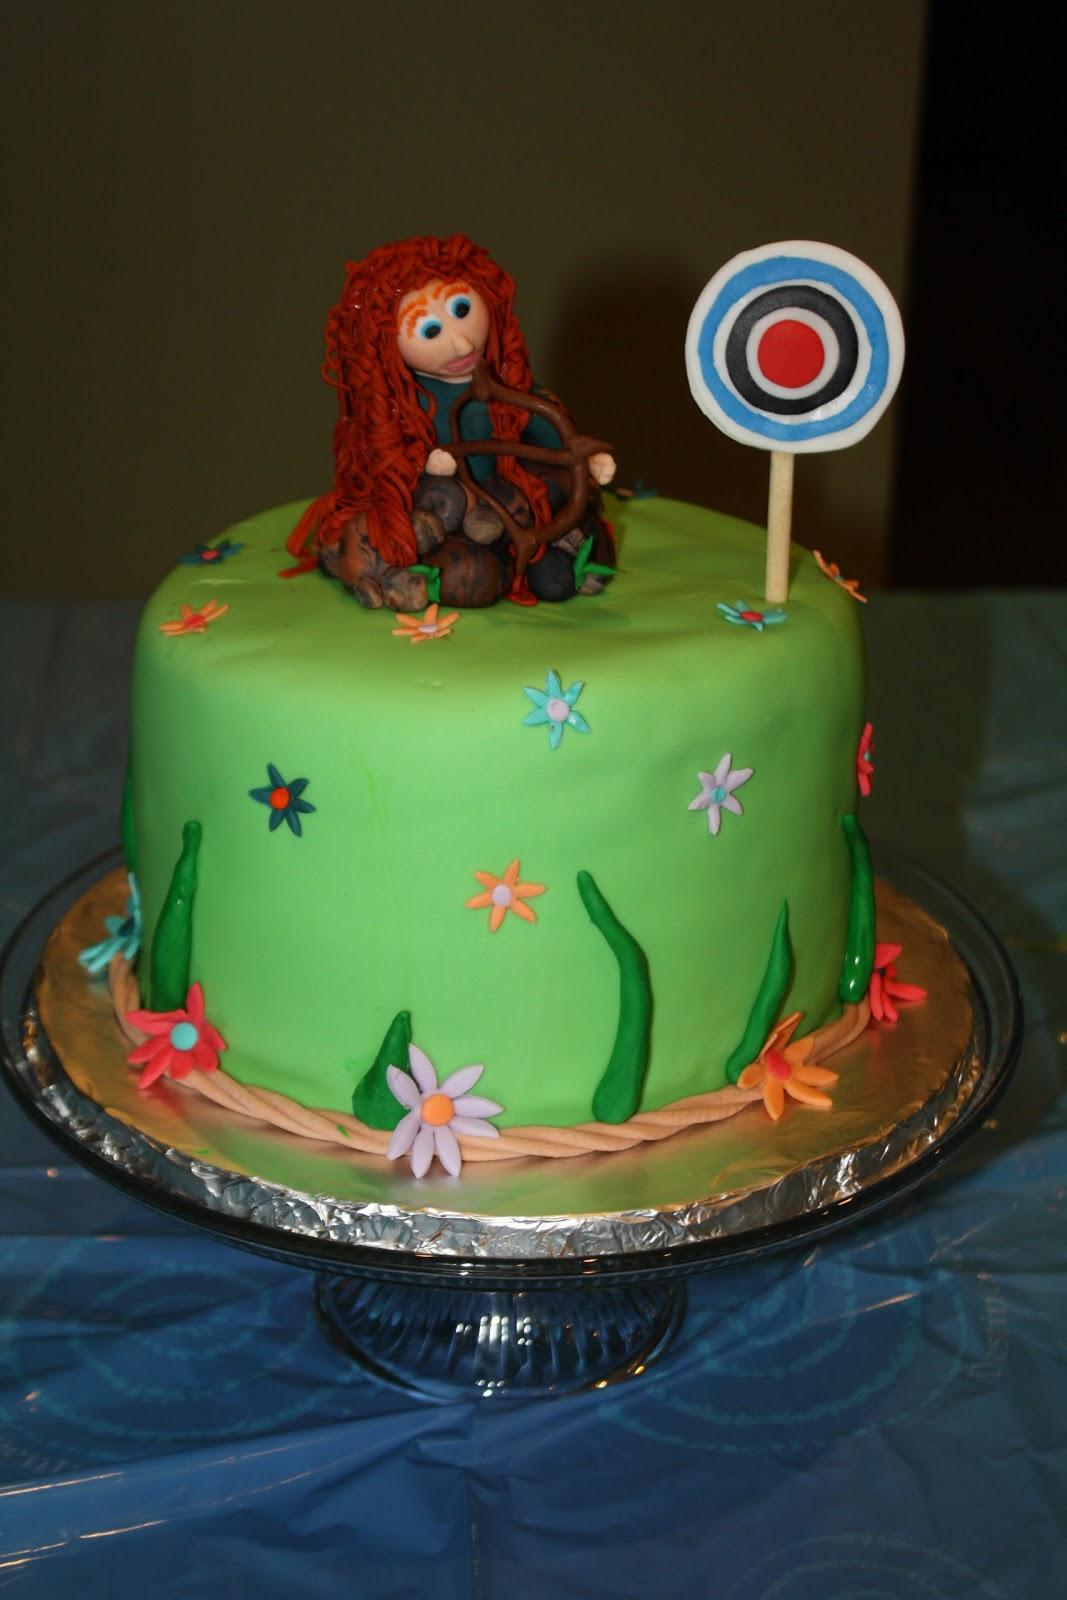 Hock Cakes Llc Brave Merida Cake